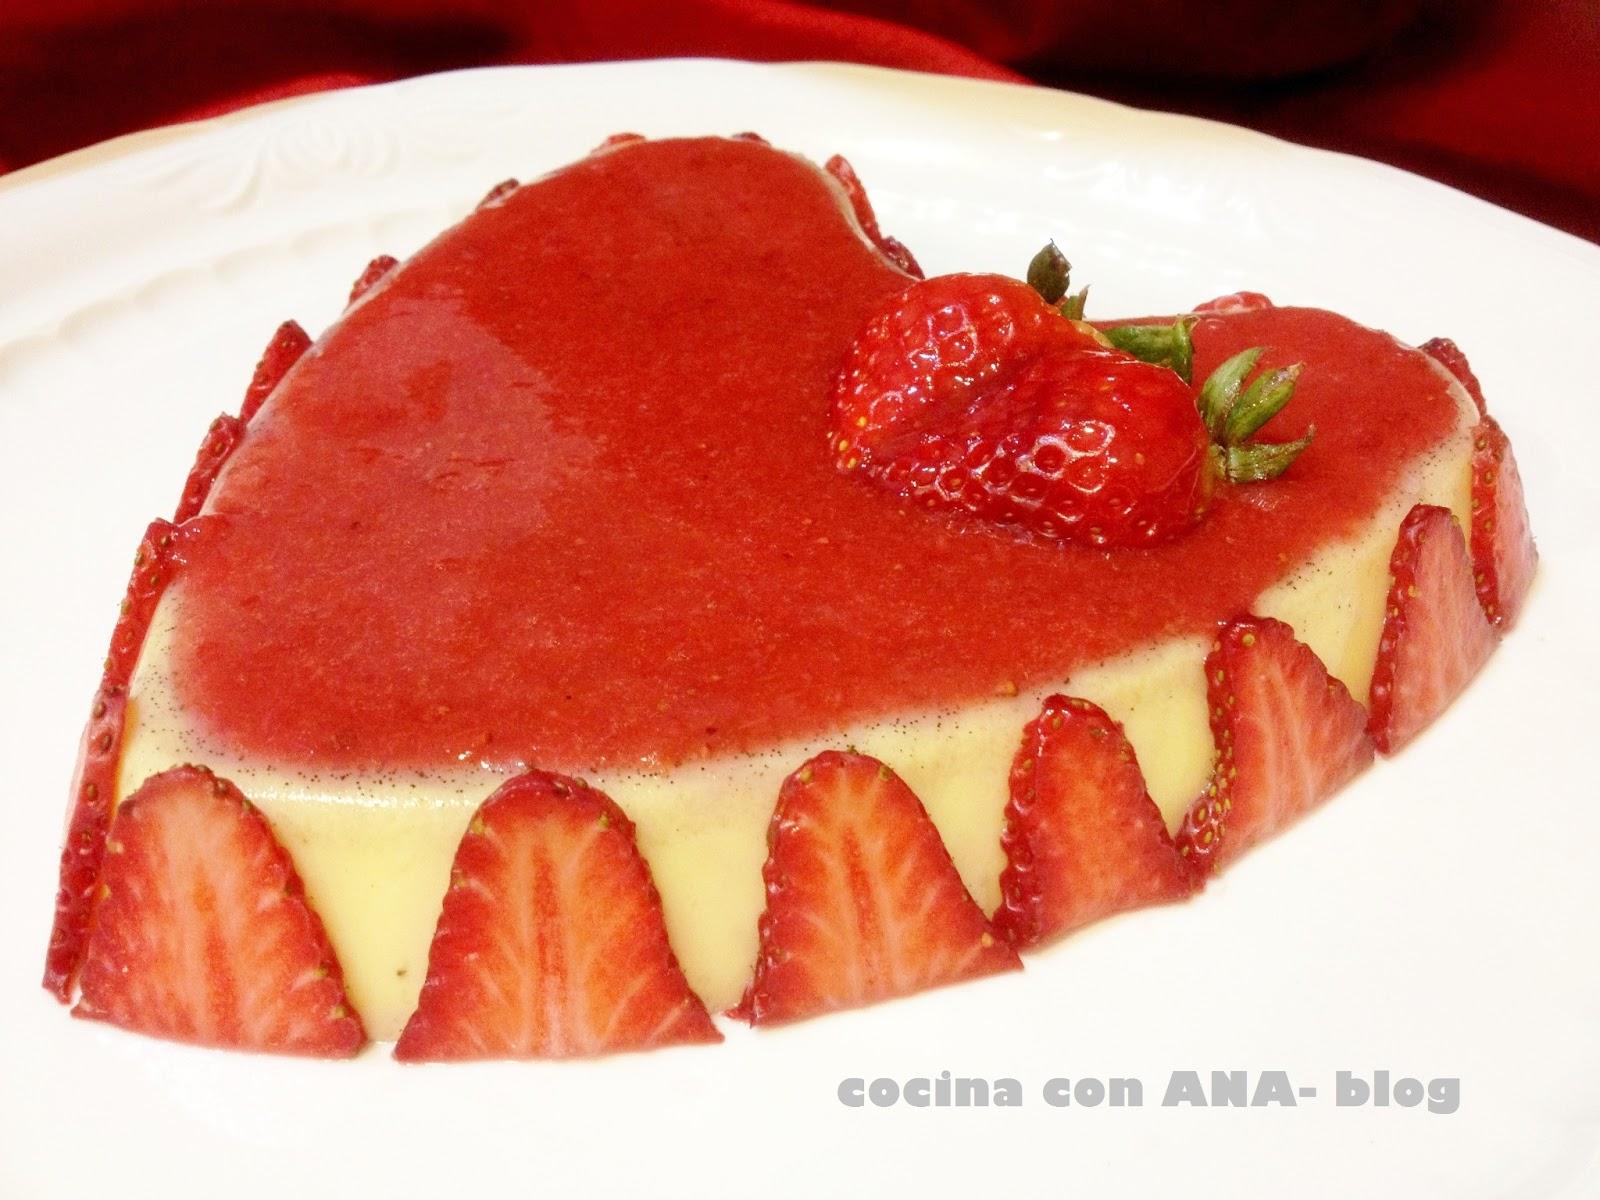 Cocina con ana corazon de fresas y vainilla - Ana cocina facil ...